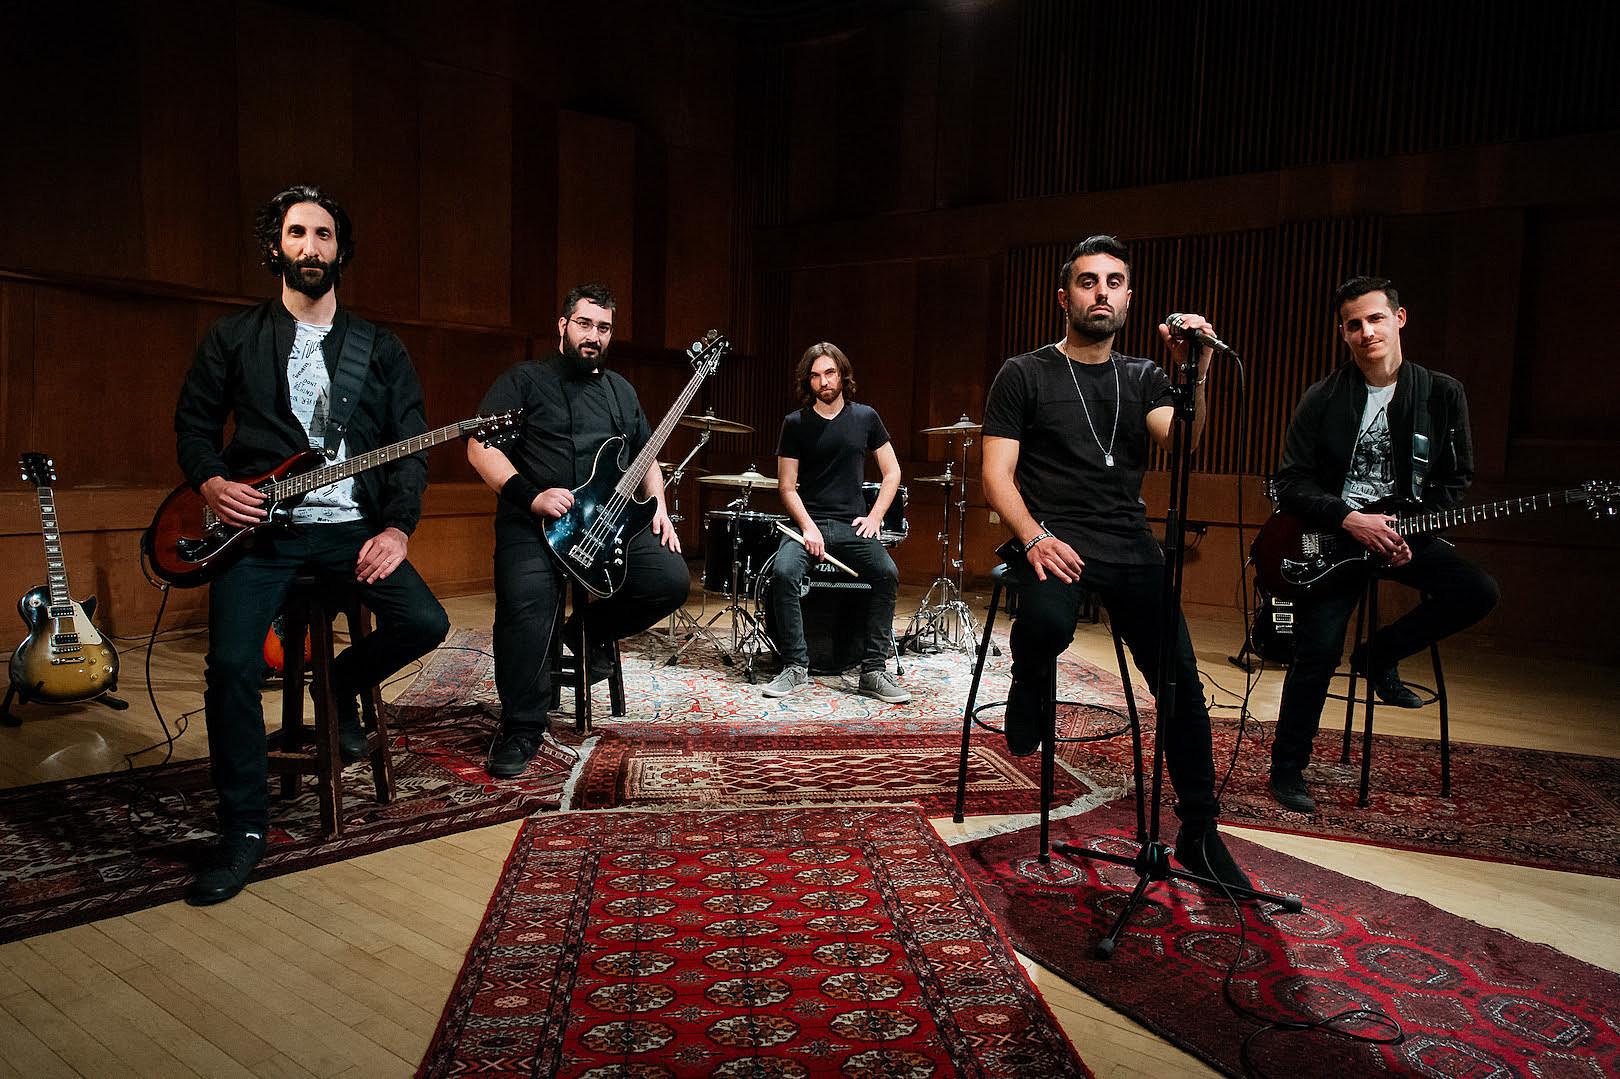 Israeli Rockers Walkways Debut Heartfelt New Song 'You Found Me'